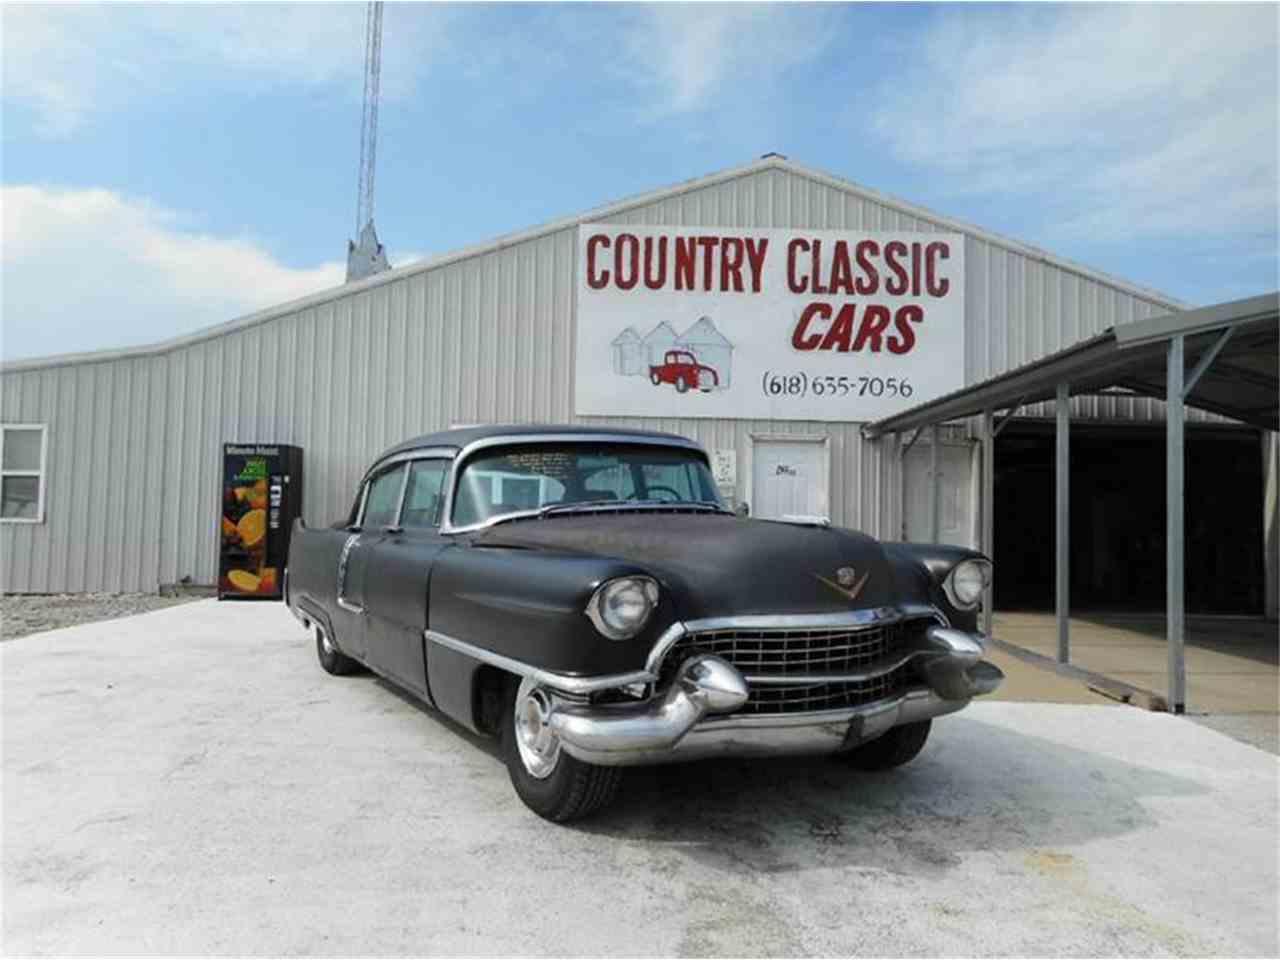 1955 Cadillac 4-Dr Sedan for Sale | ClassicCars.com | CC-974883